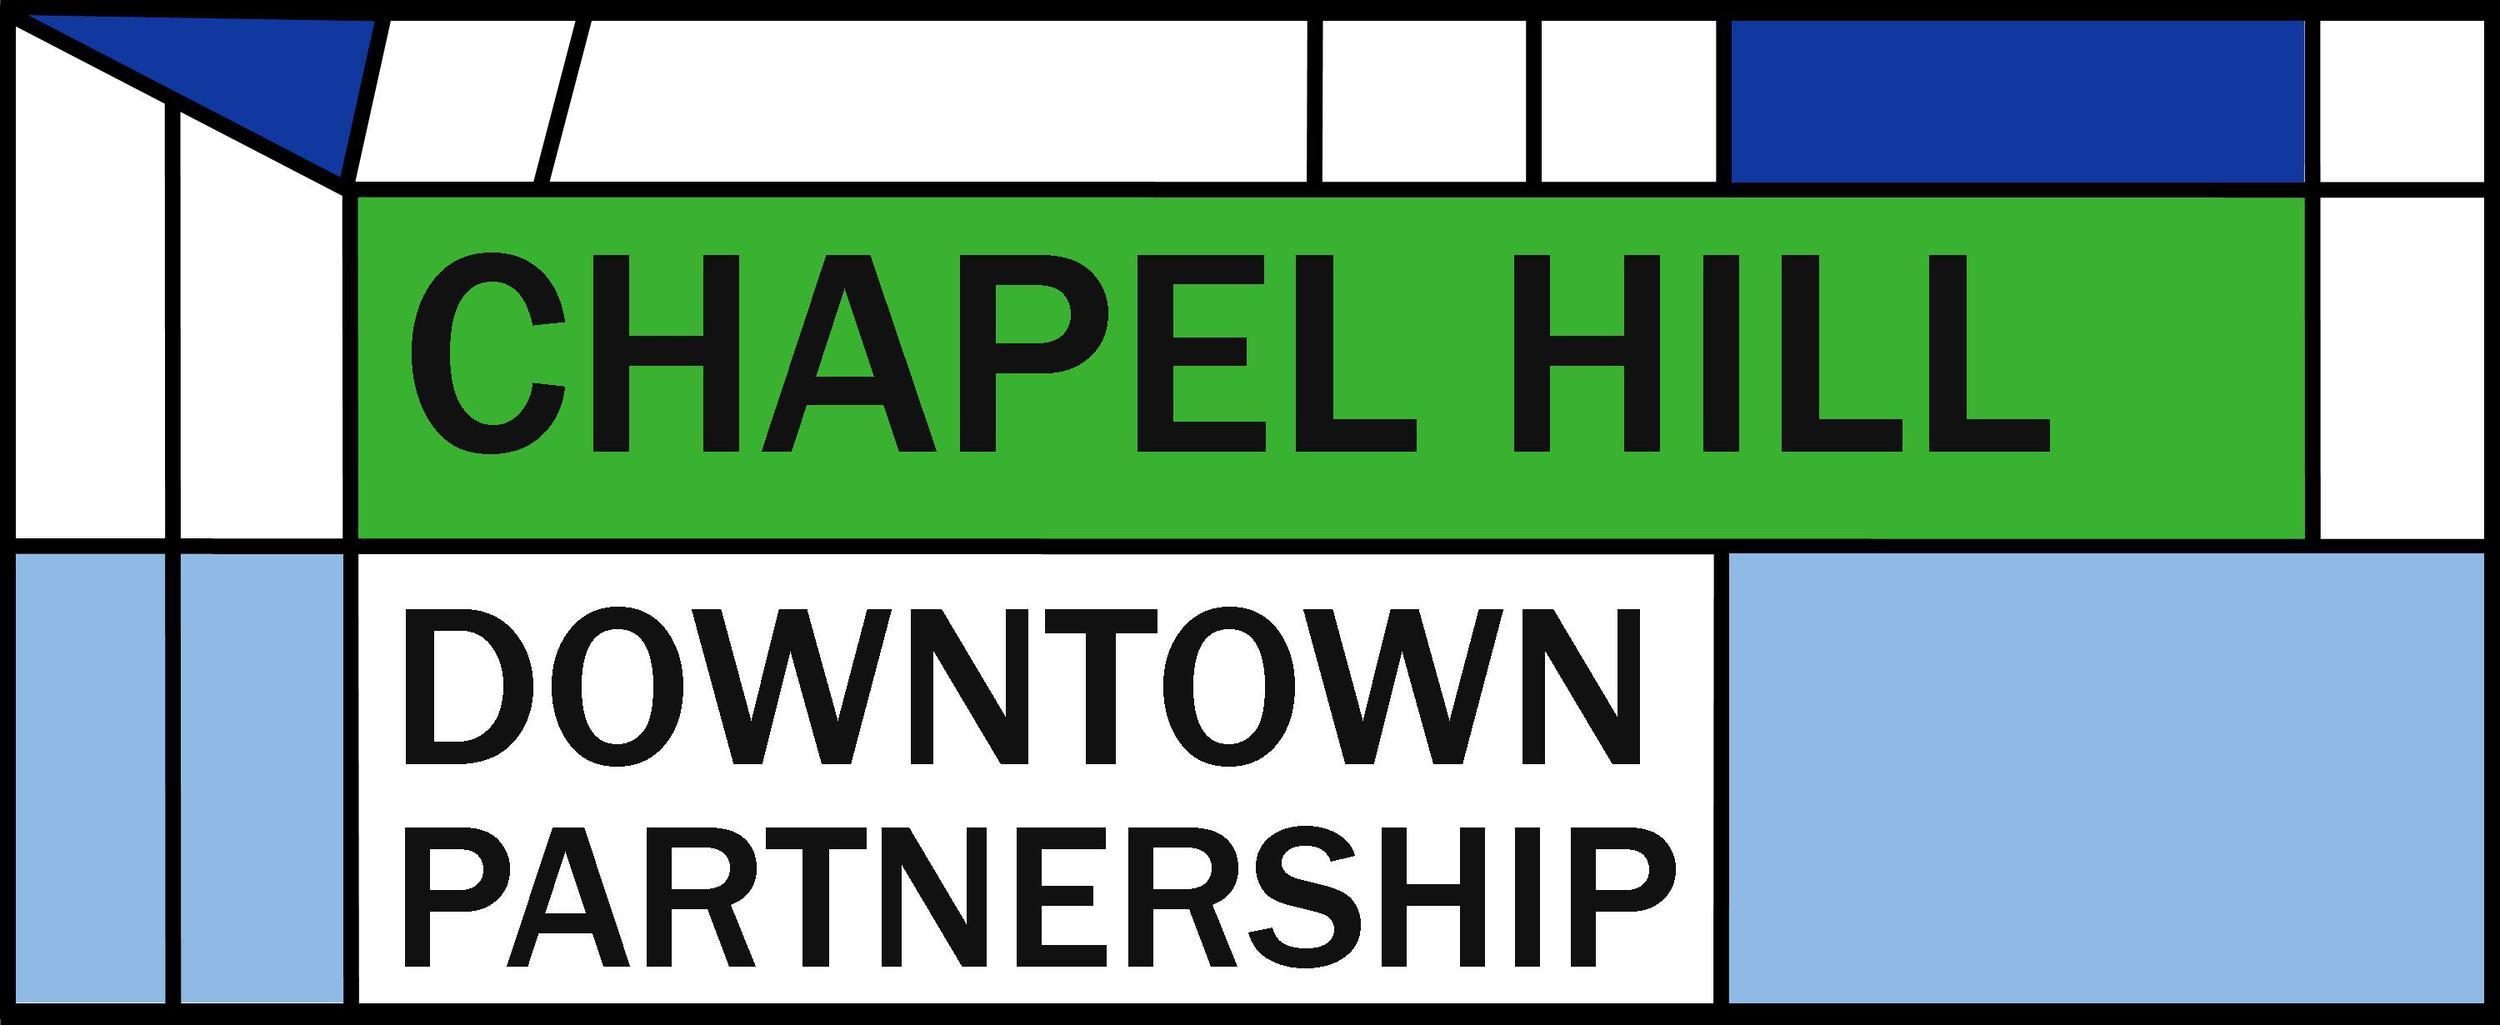 Downtown Partnership Logo Narrow High Quality.jpg